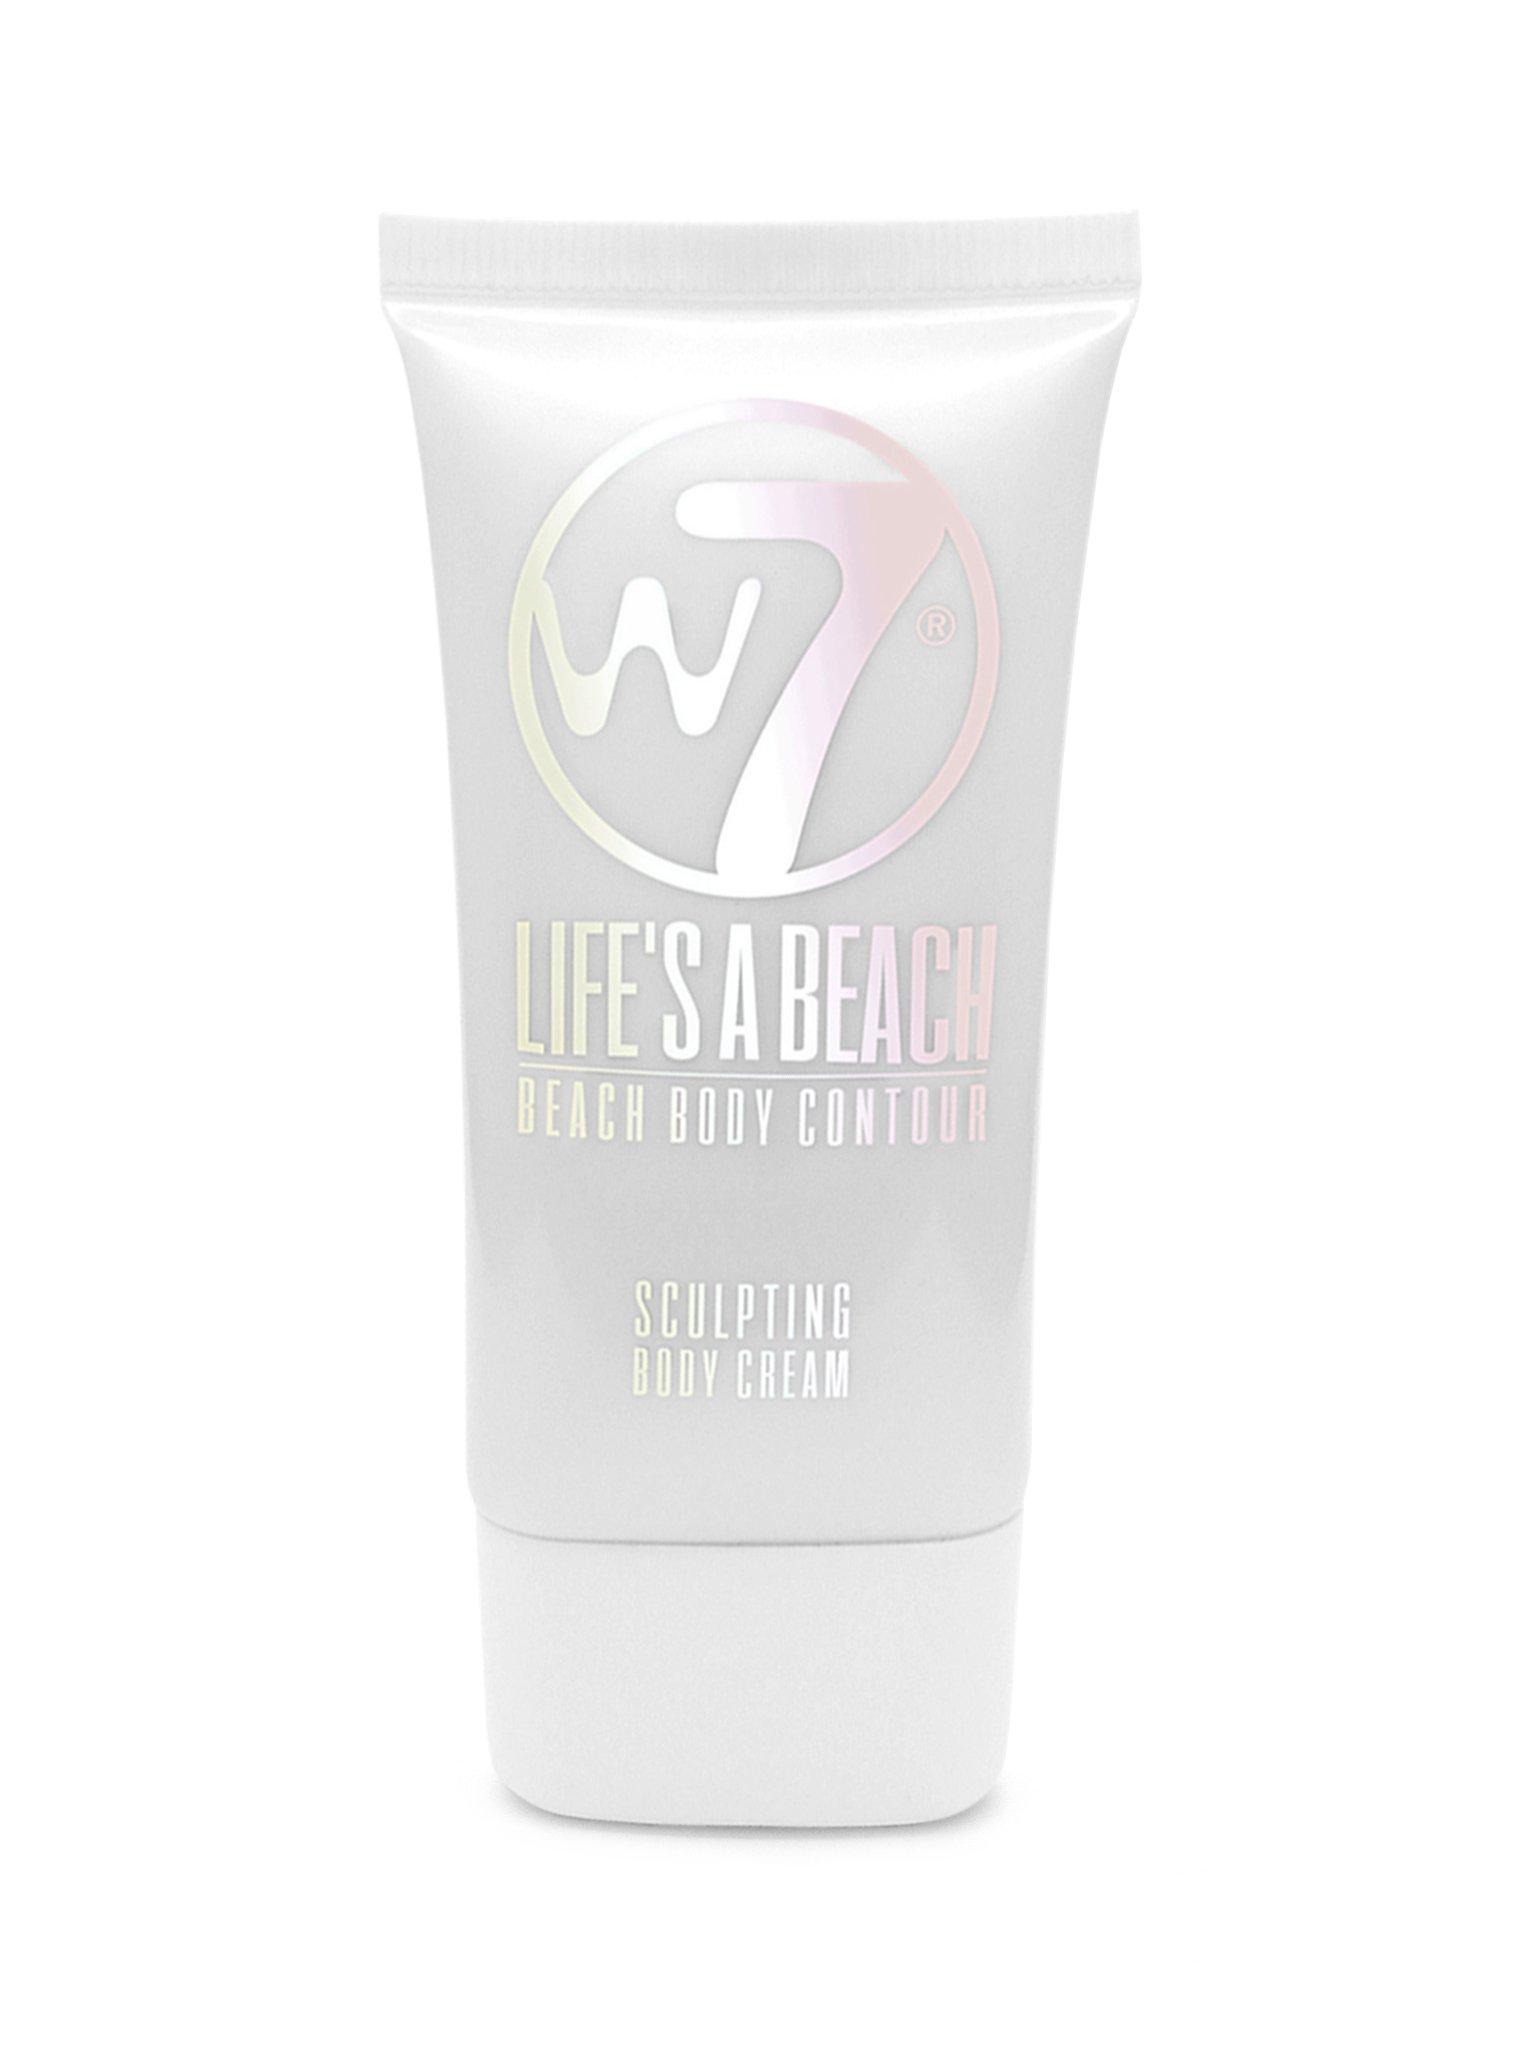 W7 Life's a Beach Body Sculpting Cream - Party Princess Pearl